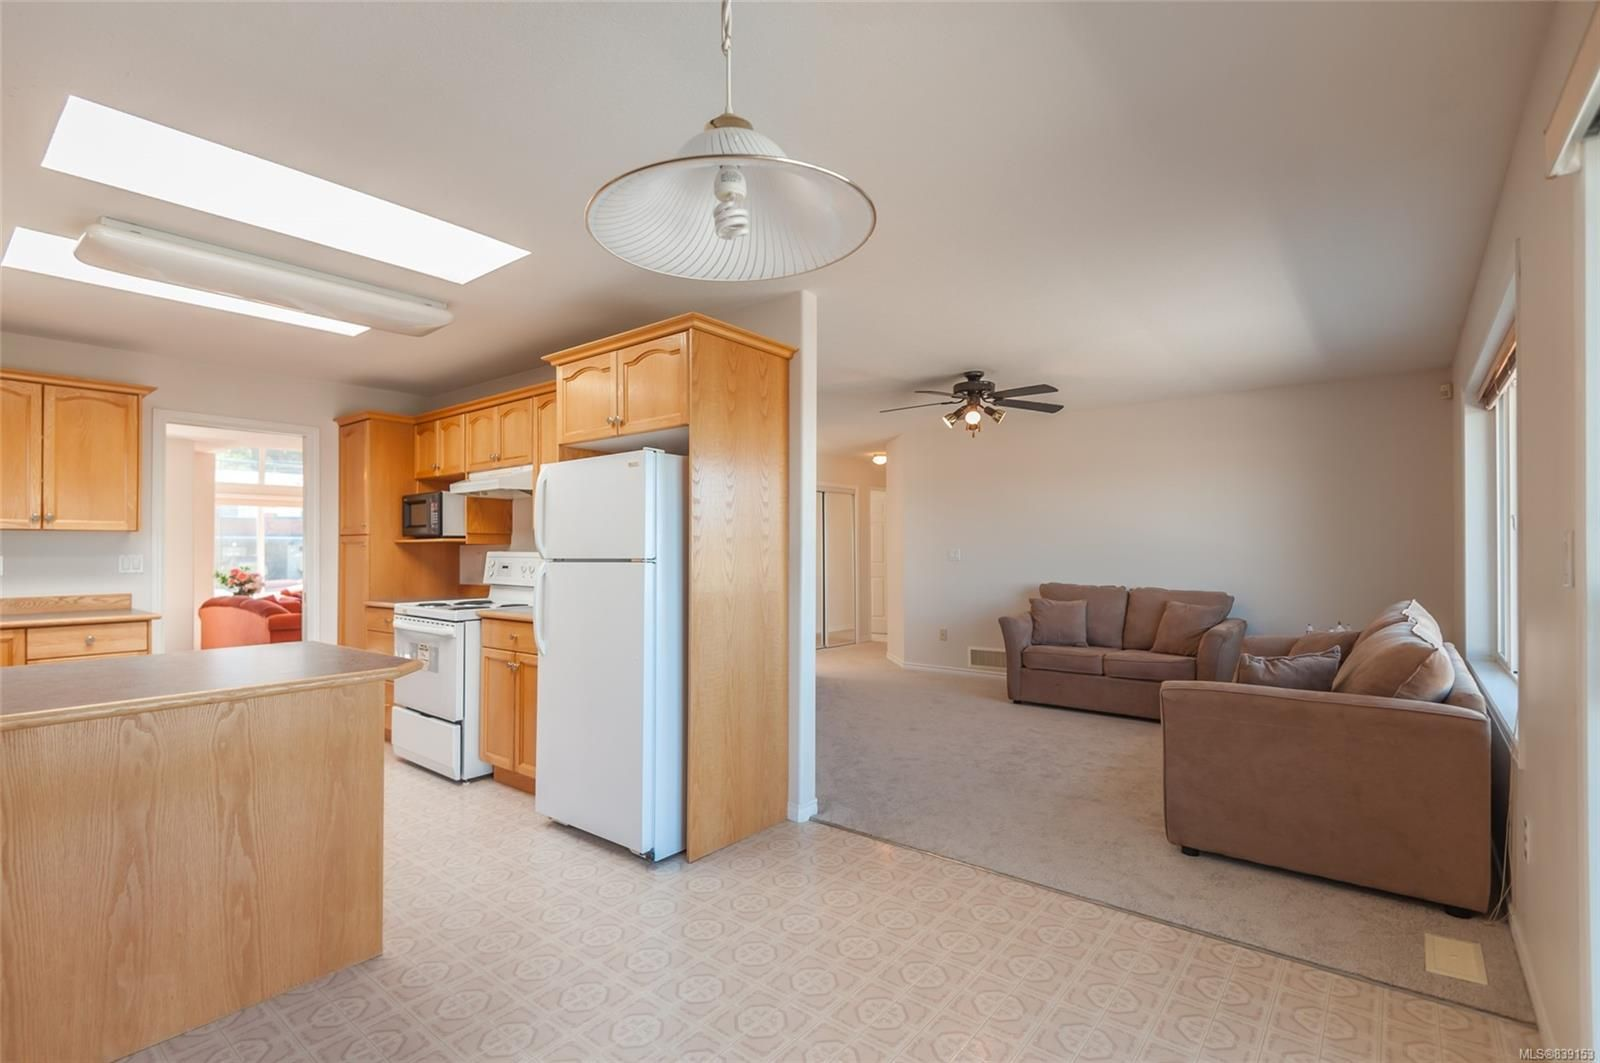 Photo 19: Photos: 6412 Dover Rd in NANAIMO: Na North Nanaimo House for sale (Nanaimo)  : MLS®# 839153